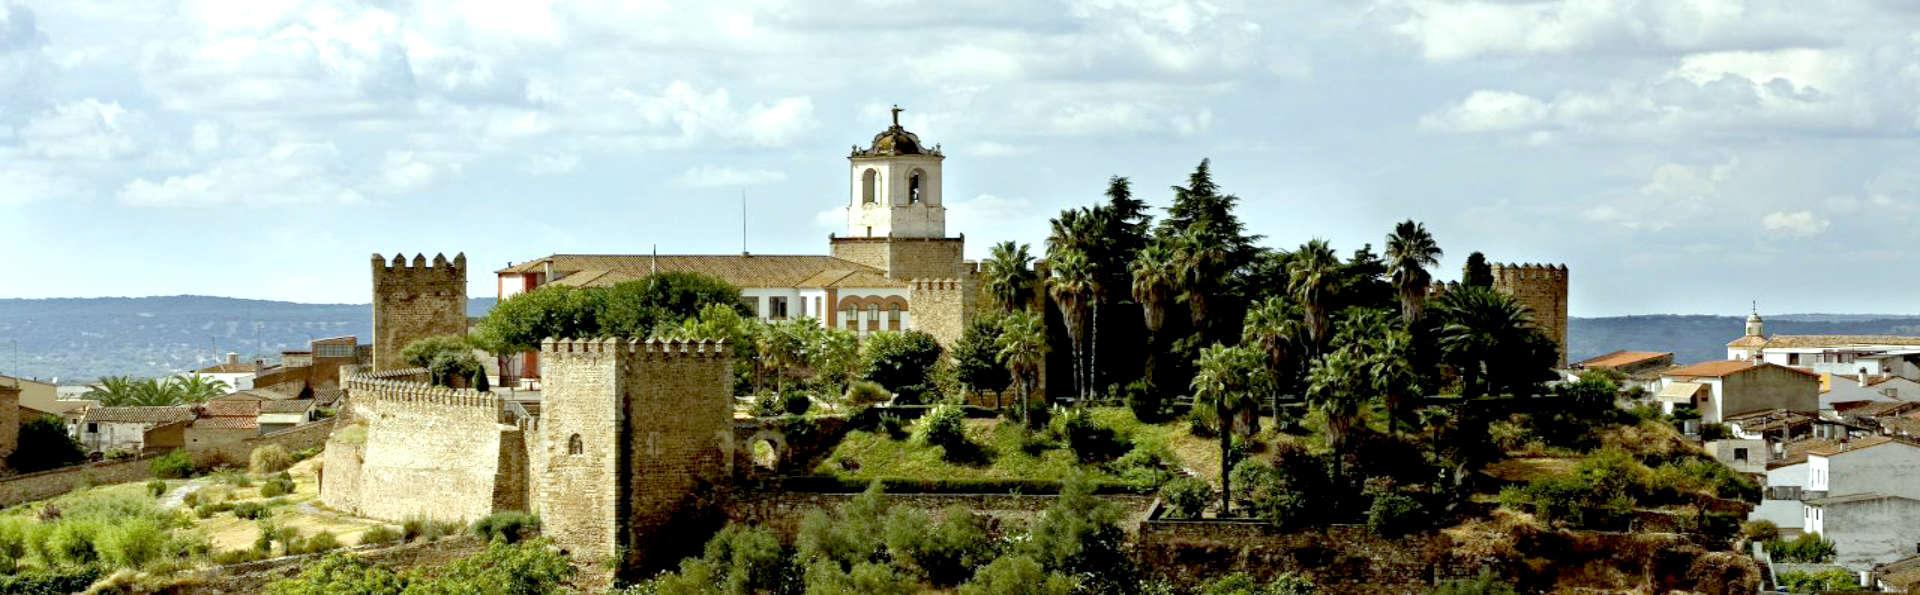 Hotel Hacienda Arroyo La Plata - Edit_destination.jpg